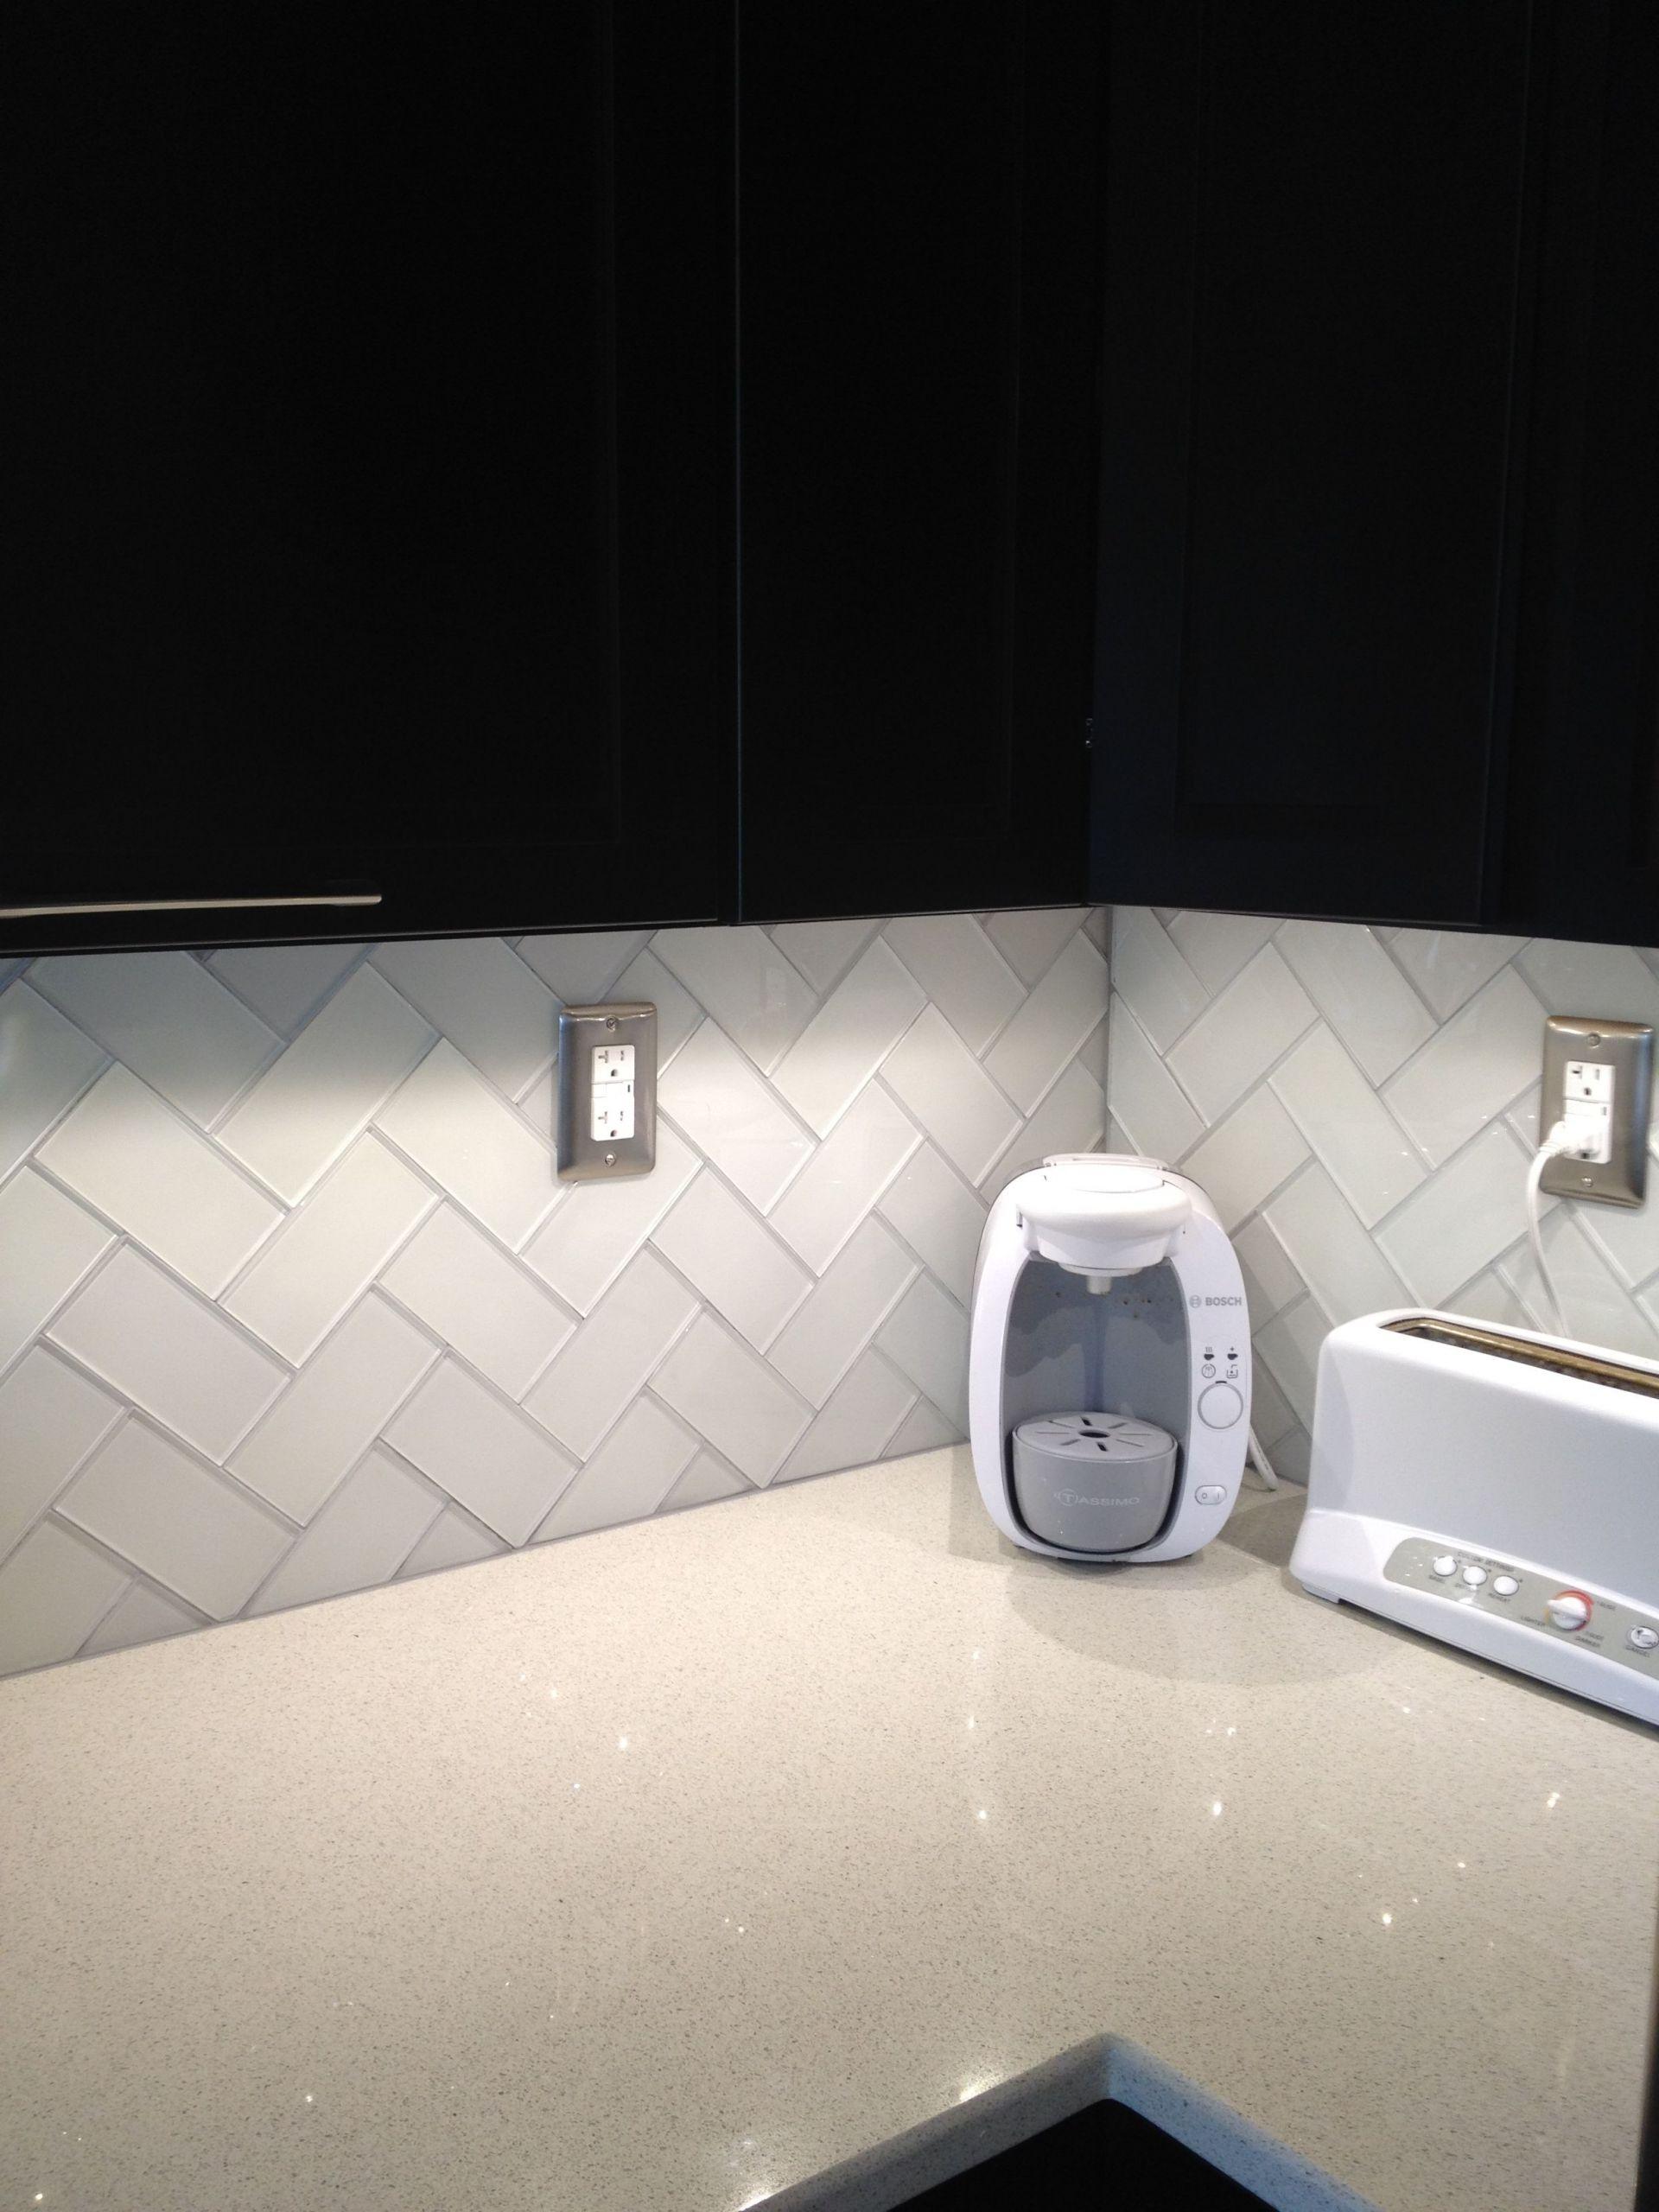 Herringbone Subway Tile Kitchen Backsplash Best Of Herringbone Pattern White Glass Subway Tile Added Delorean